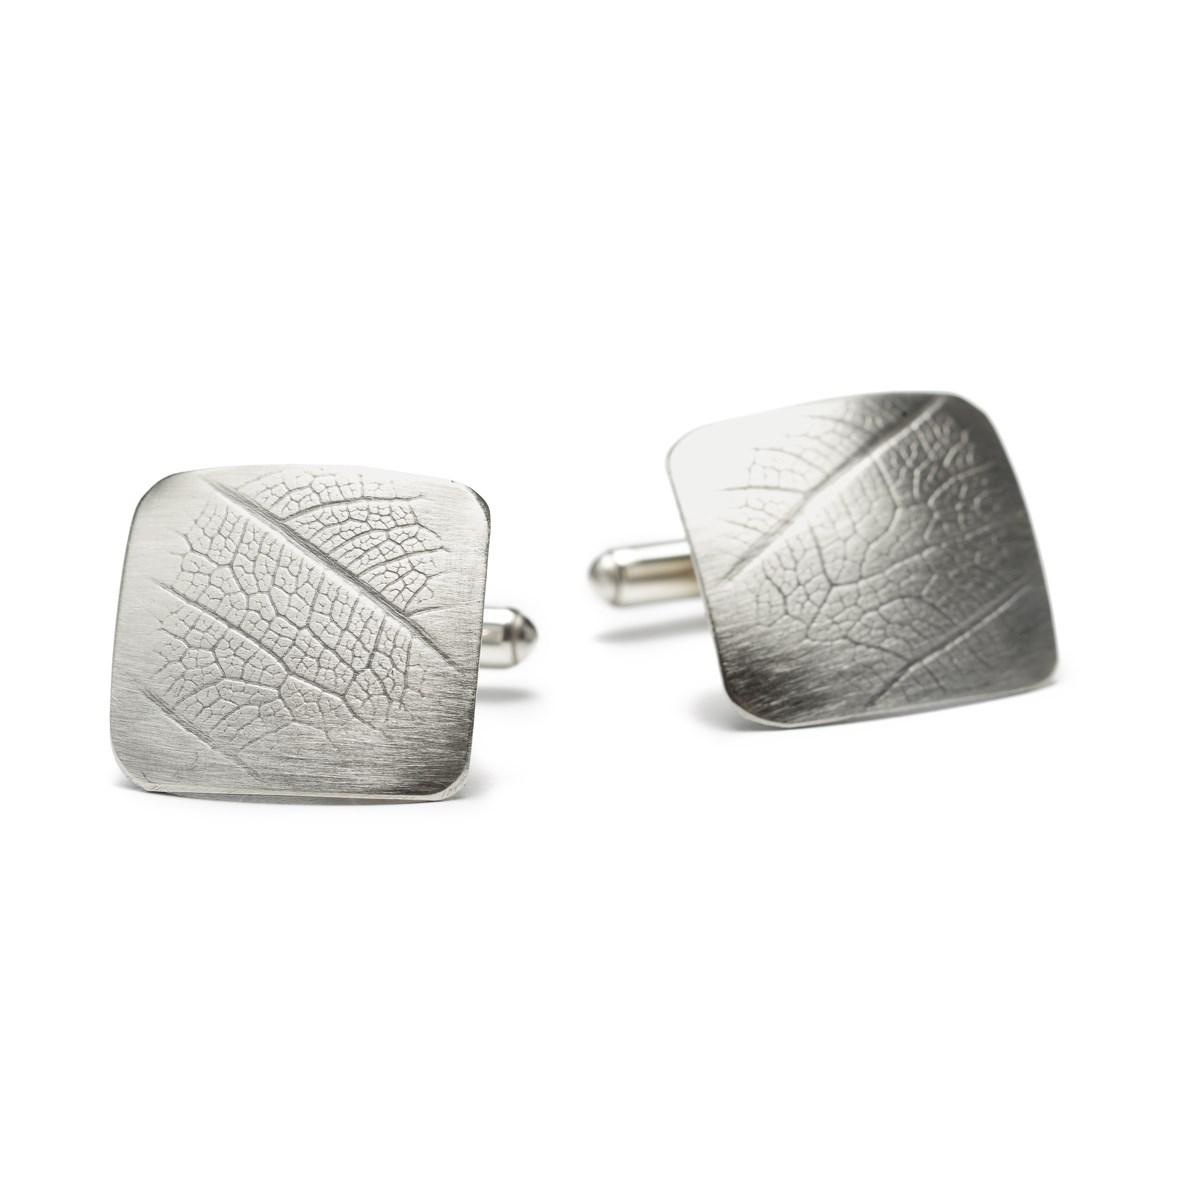 Eva Van Kempen Art Jewellery From Amsterdam The Netherlands Hoc Store Titanium Cufflinks Set 09